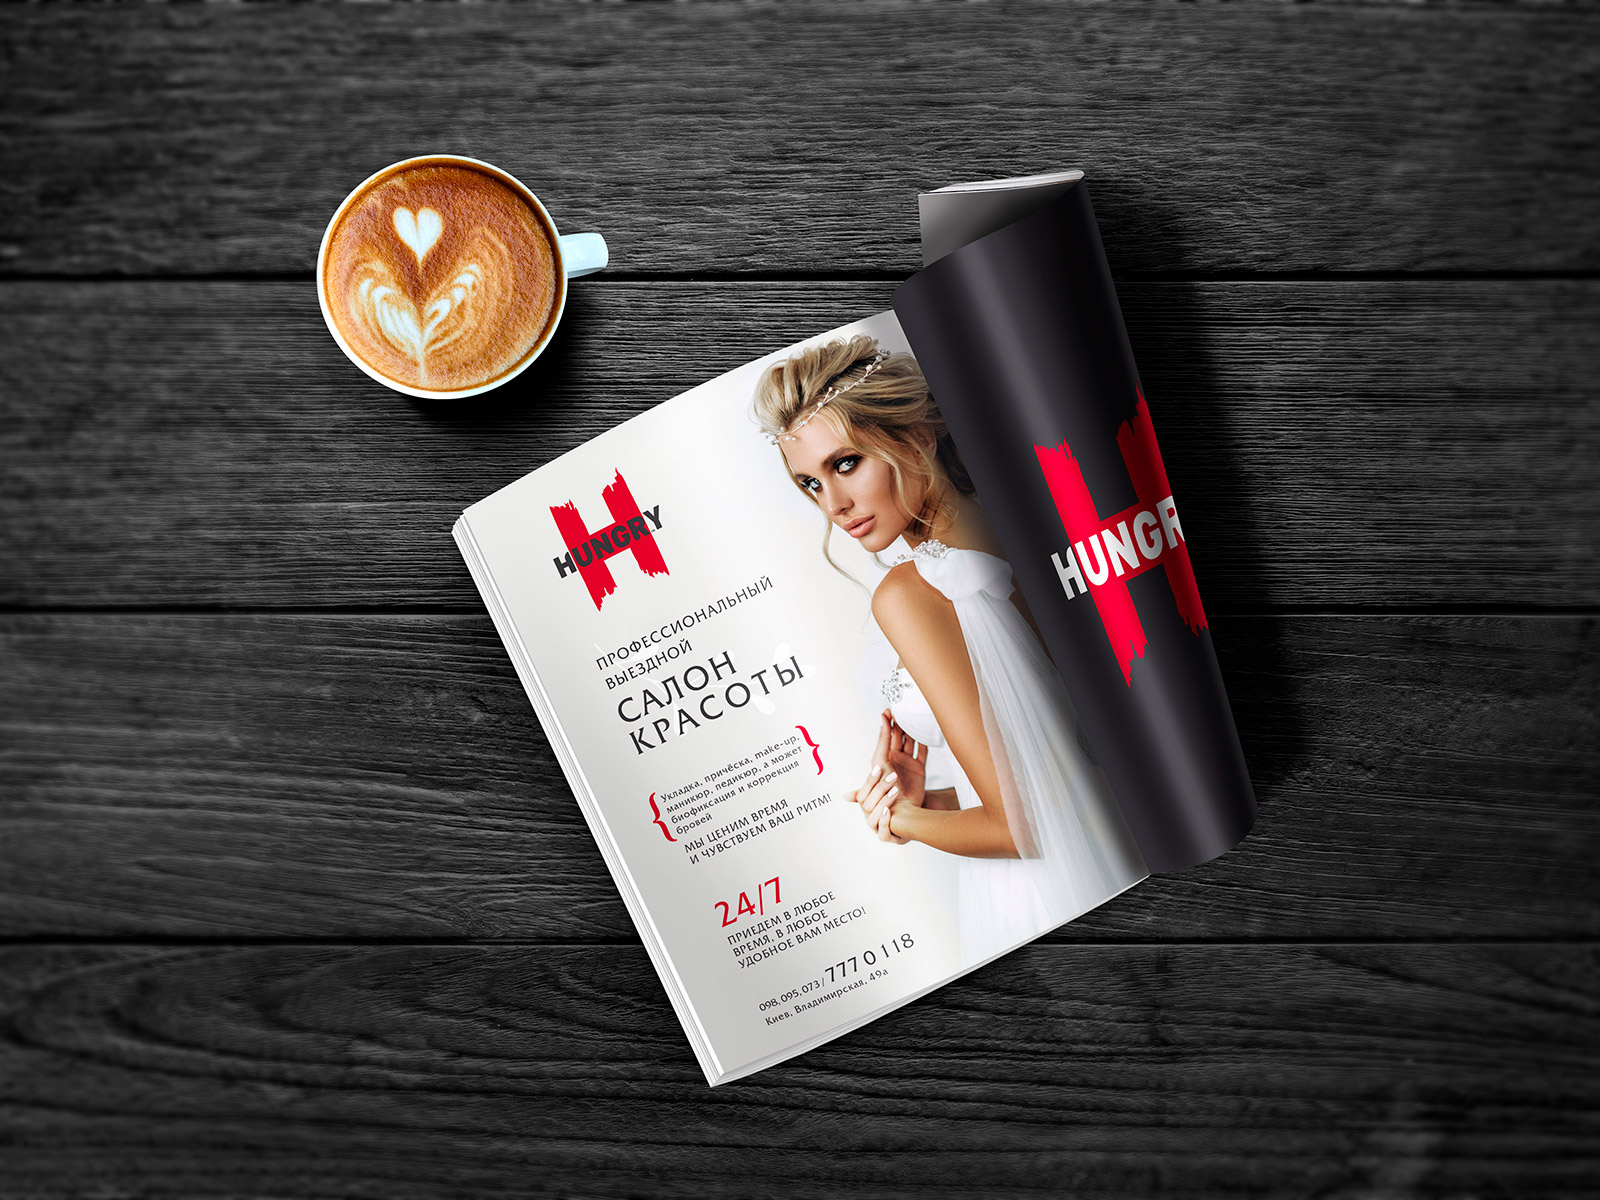 Разработка рекламного макета в журнал Киев. Реклама салона красоты HUNGRY